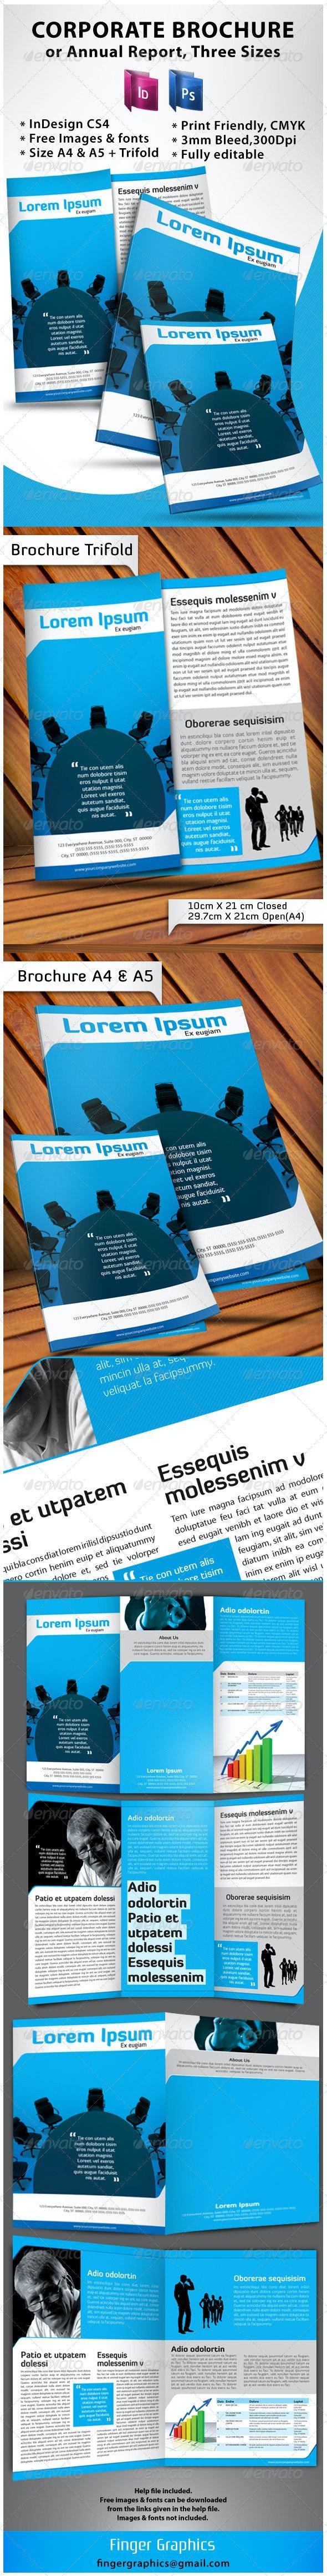 Corporate Brochure A4 + A5 + Trifold - Corporate Brochures